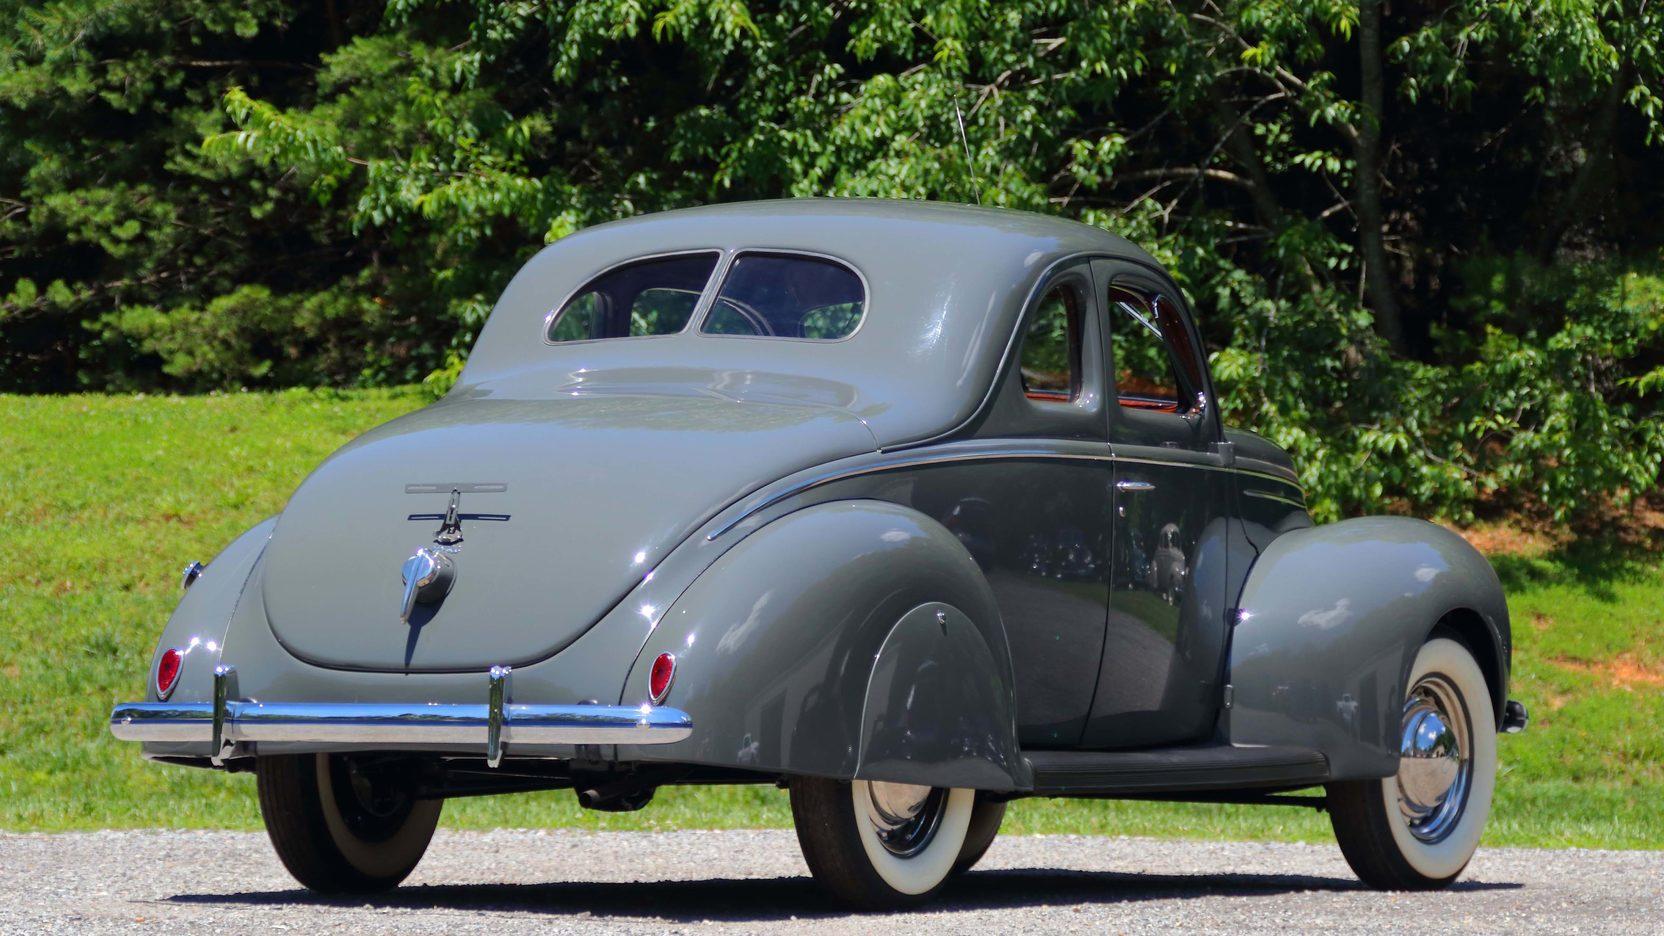 1939 Ford Deluxe Coupe  S81  Dallas 2017